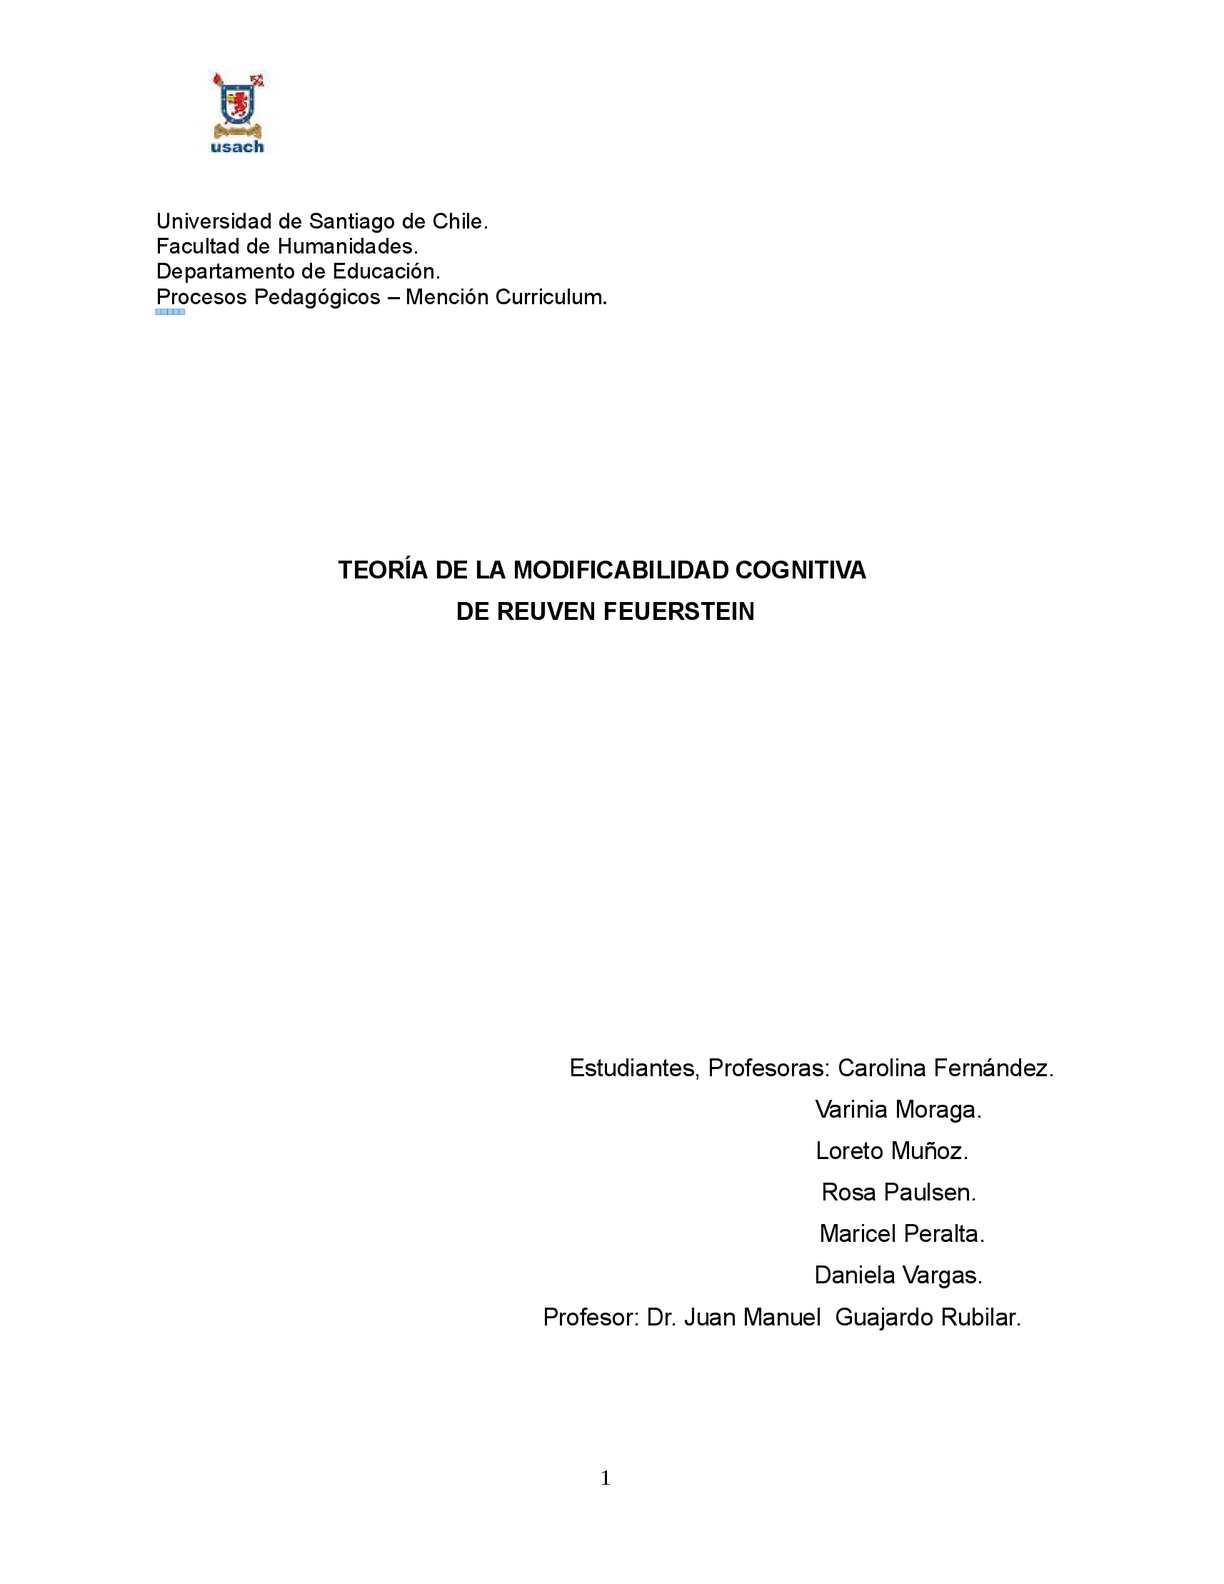 Calaméo - Borrador Trabajo Final Feuerstein